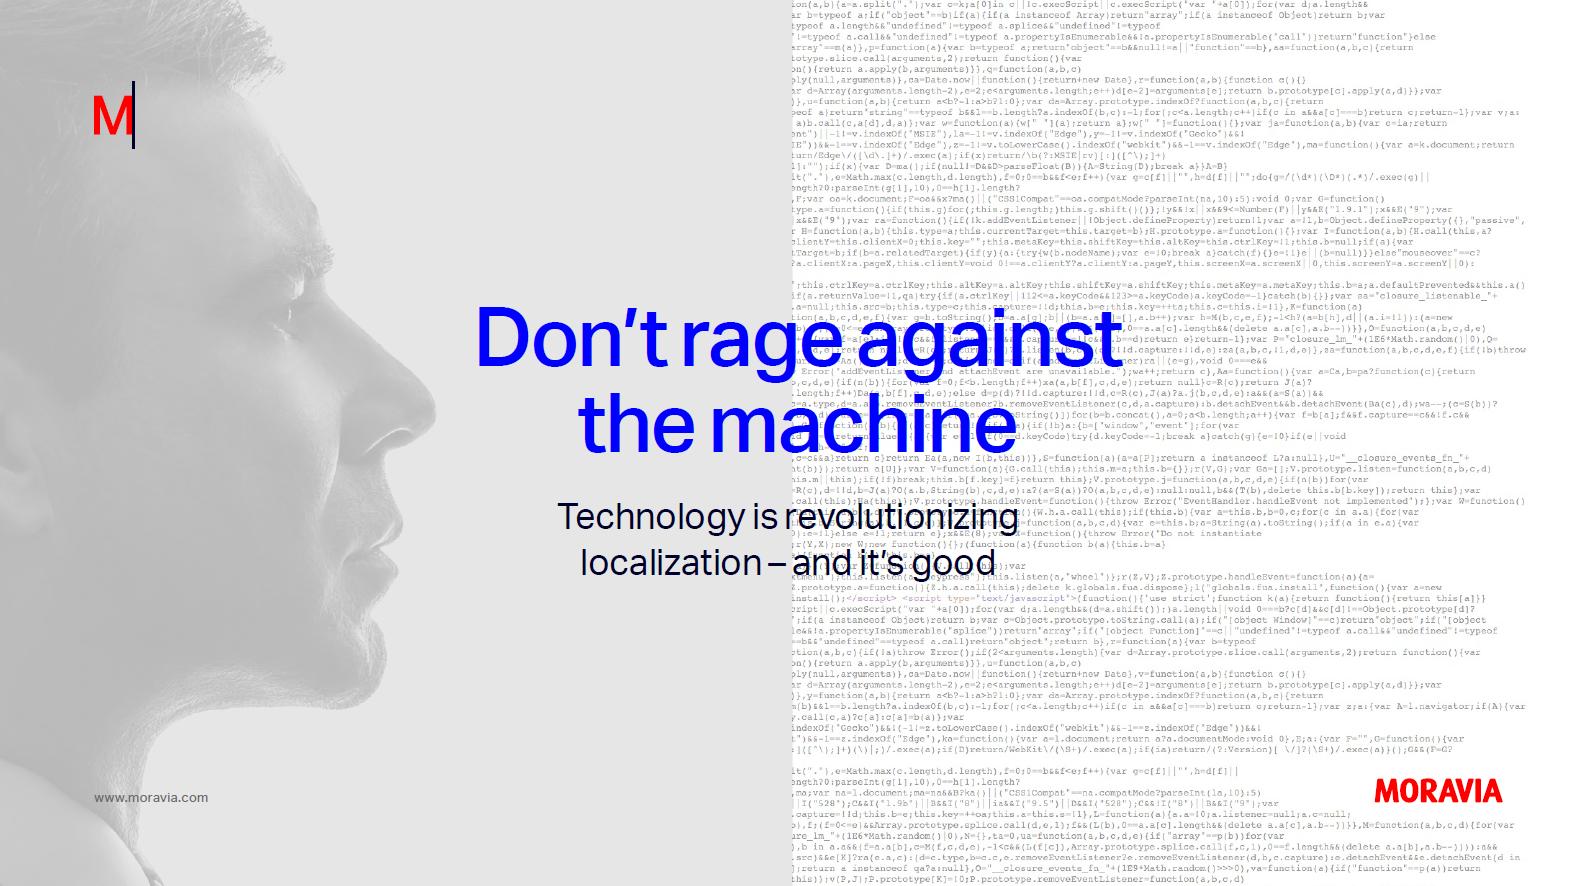 No luche contra la máquina